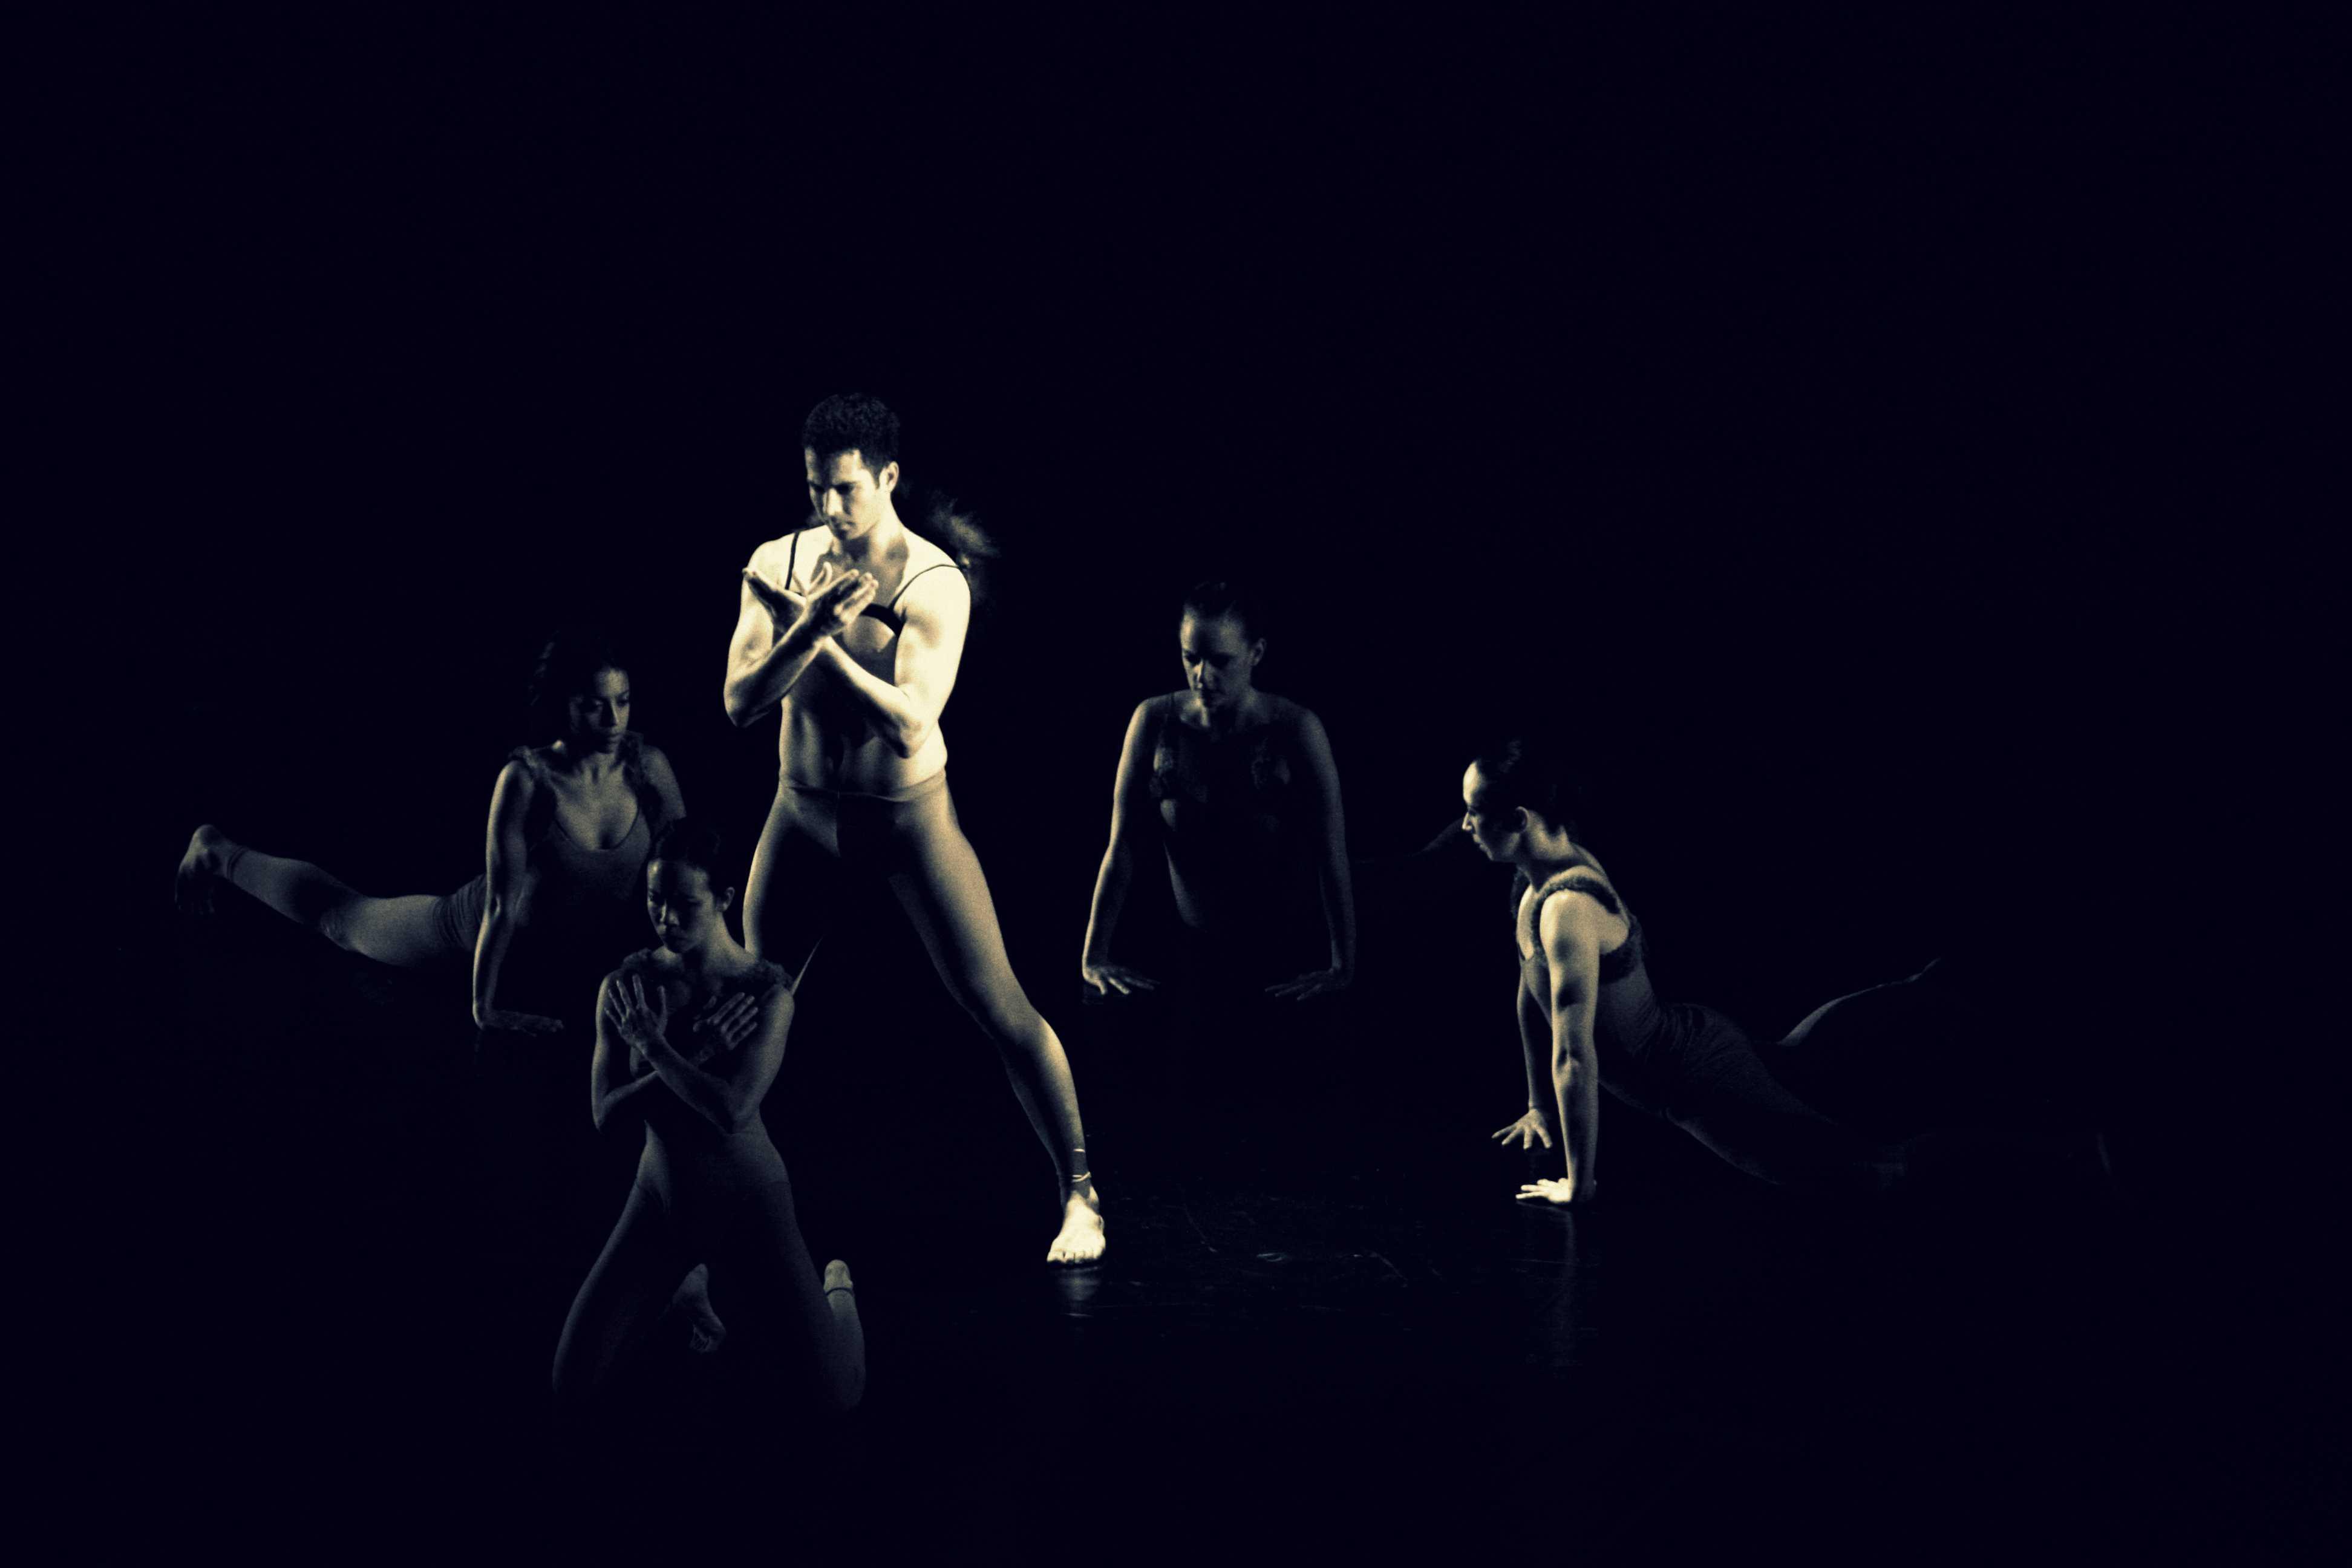 Ballet-photo-feature-sindhu-fnbworld